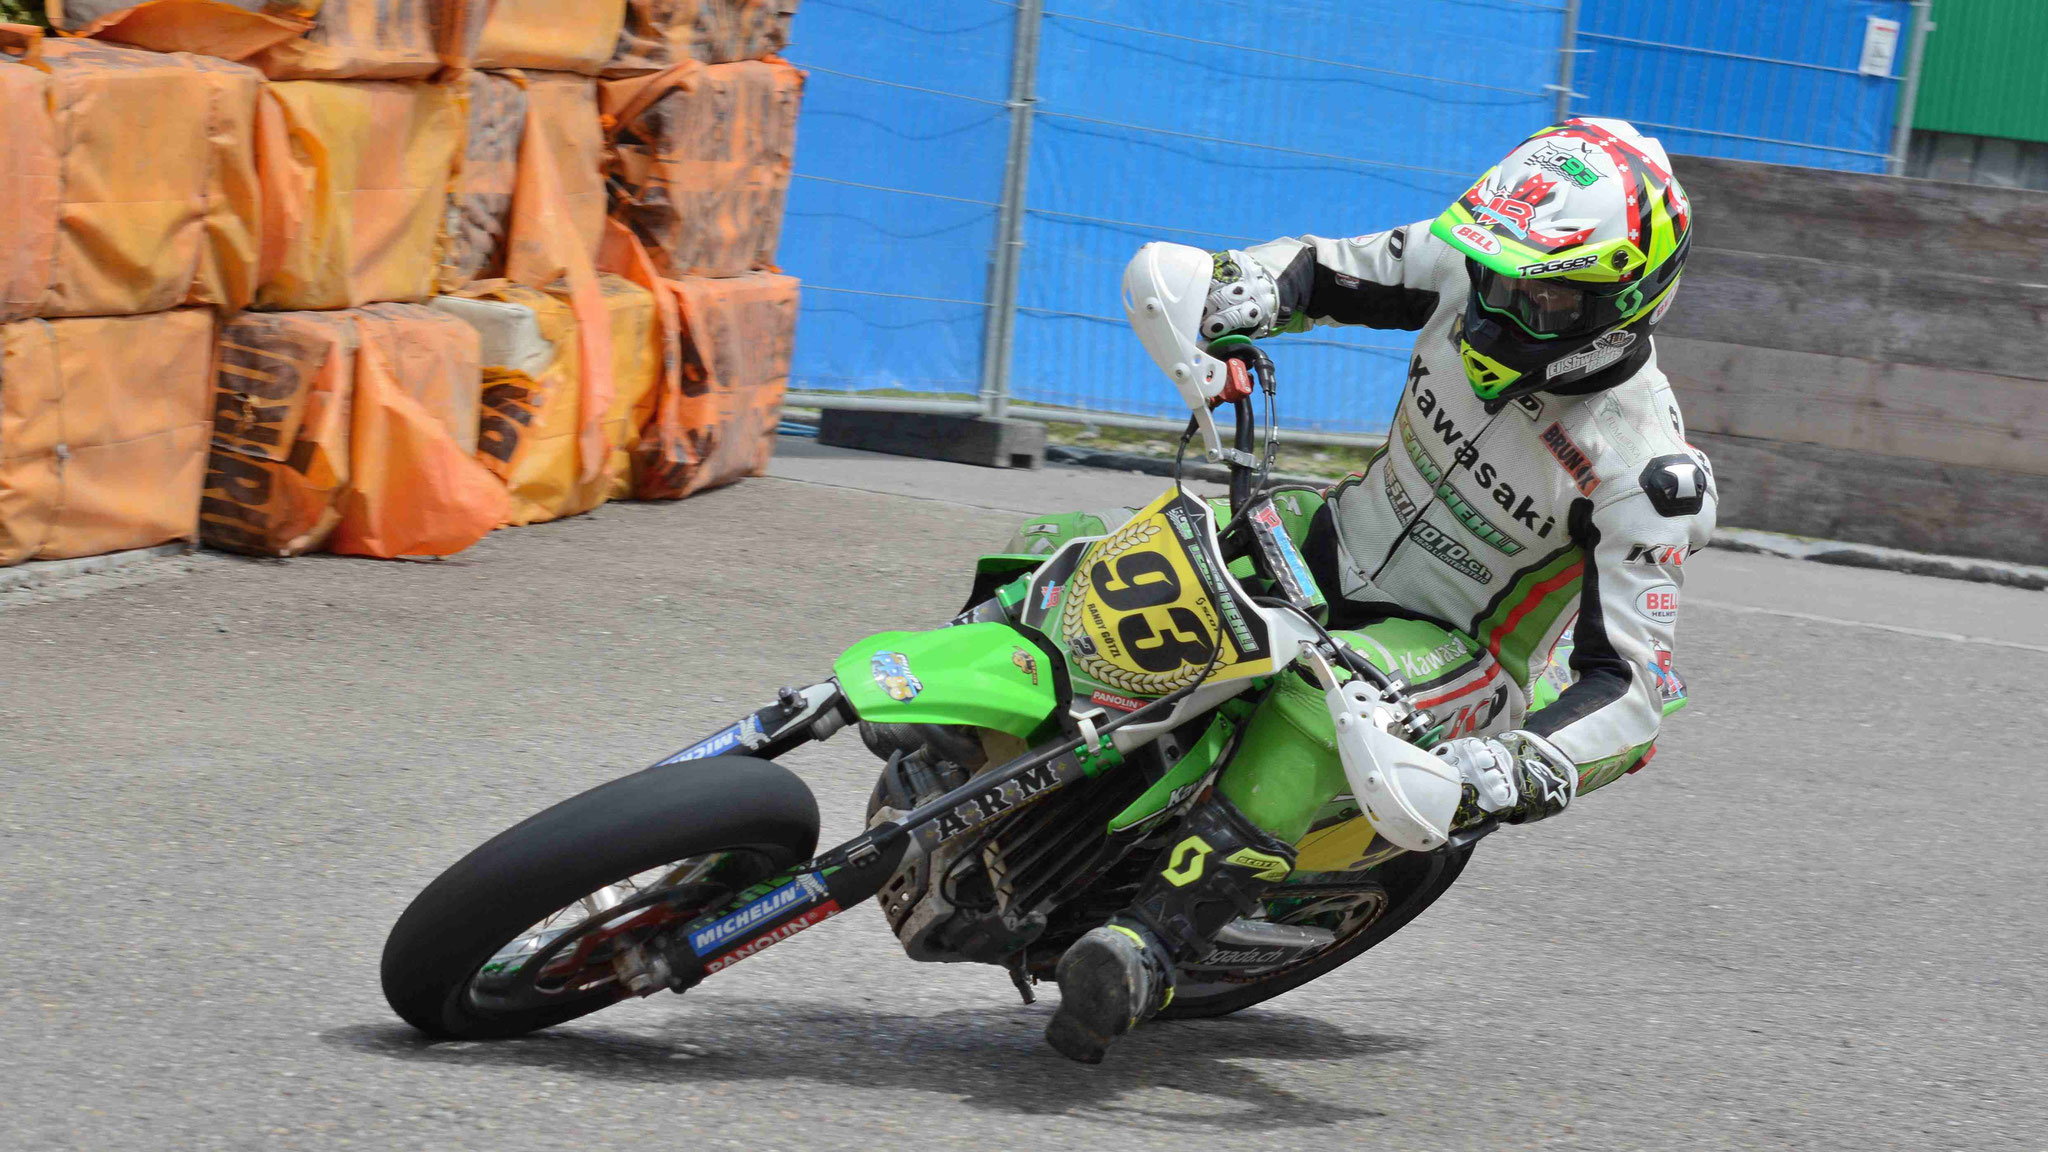 #93 Randy Götzl - Kawasaki KX